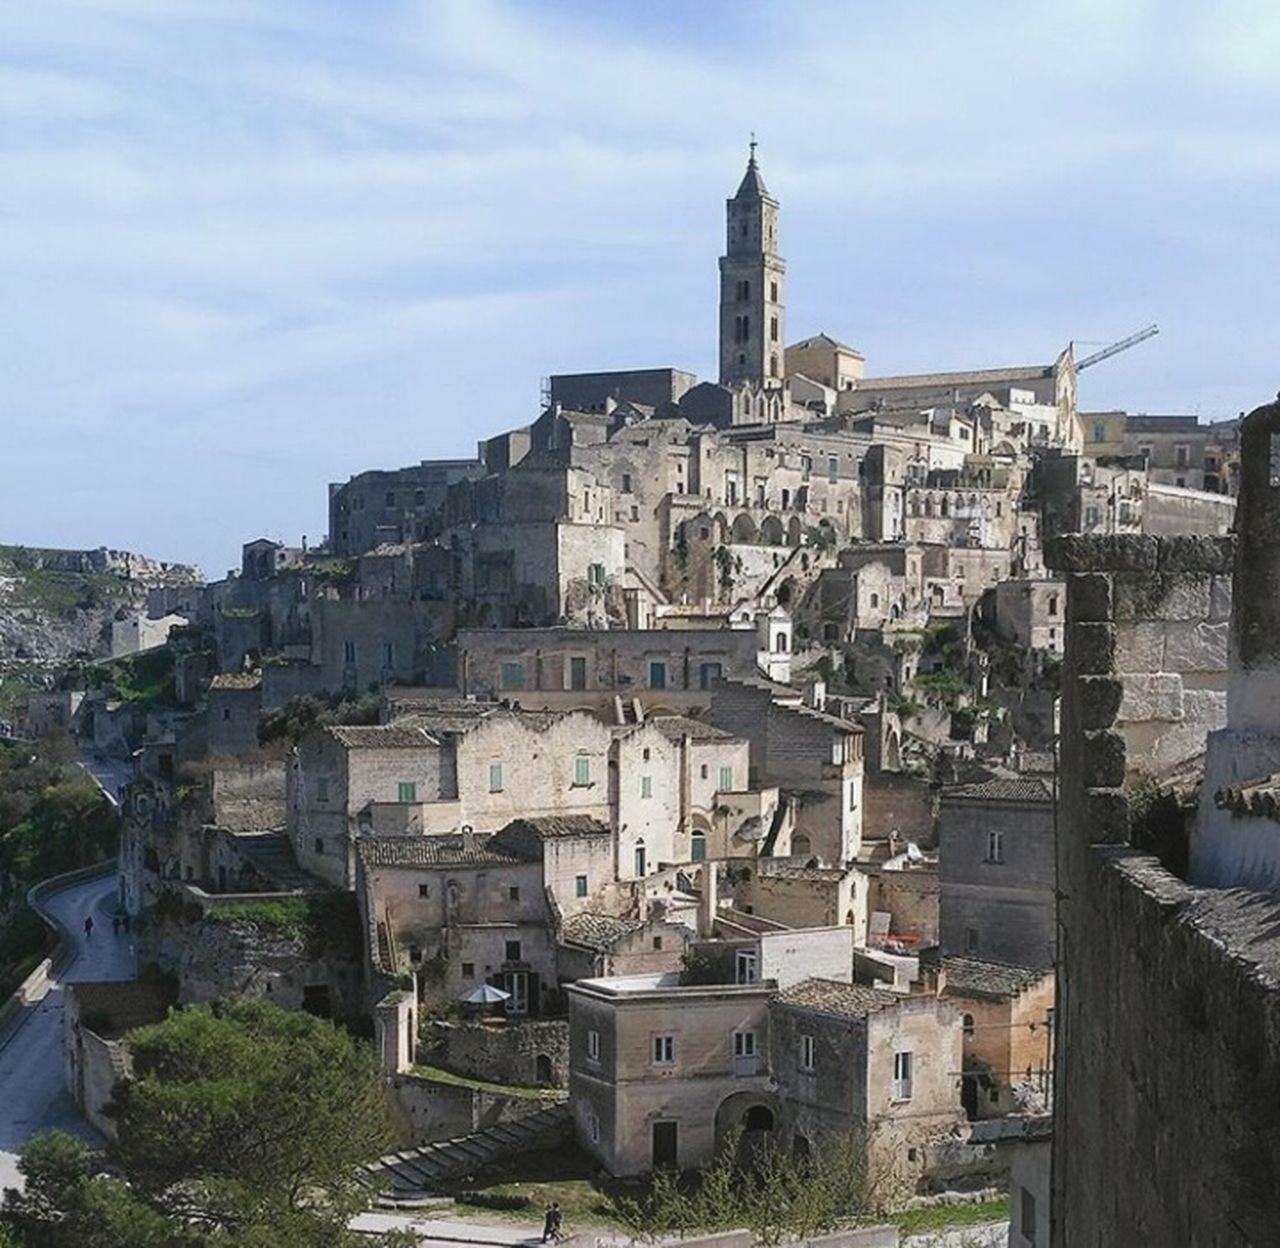 Centro storico di Matera Around Apulia Italy Italia Puglia Matera Italy Matera, Italy History City Medieval Italy❤️ Italia イタリア